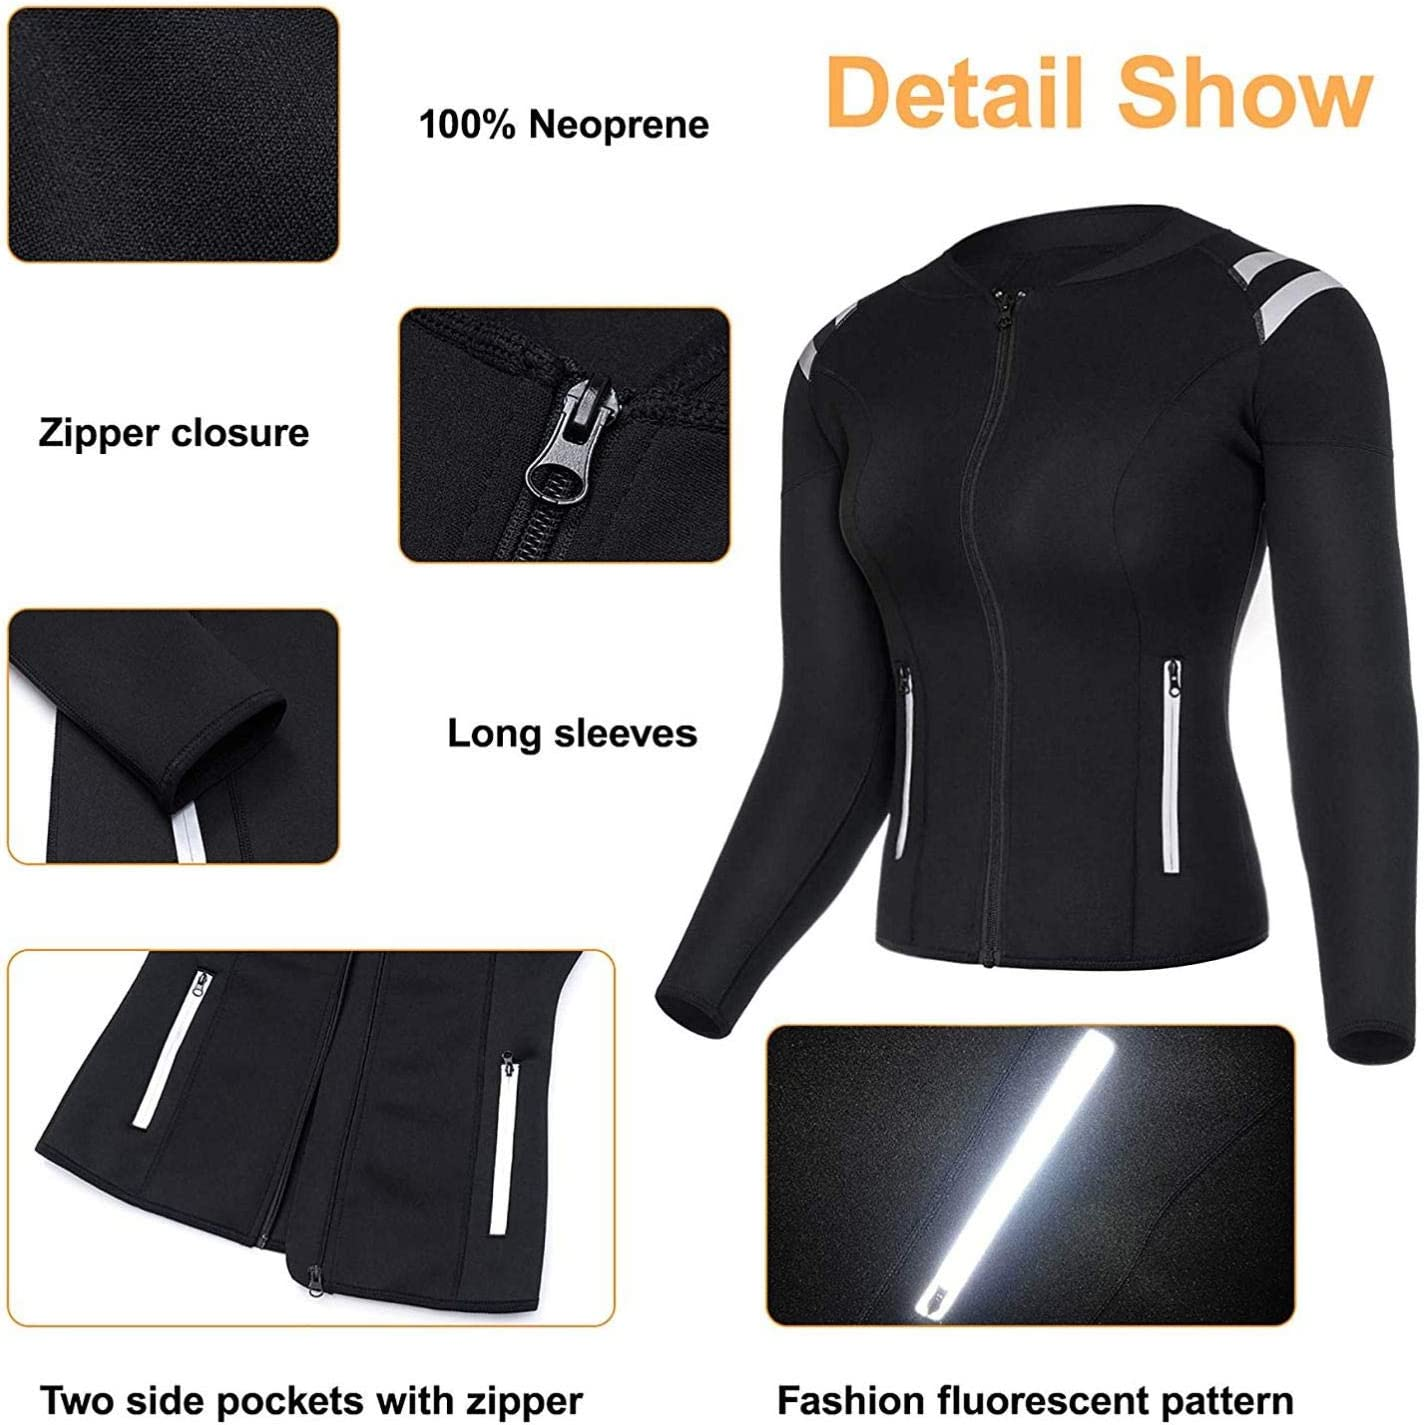 Women Sauna Suit Hot Sweat Neoprene Waist Trainer Body Shaper Workout Jacket Shirt Fat Burning Shapewear Slimming Top Long Sleeve with Zipper for Weight Loss Fitness Gym Wear